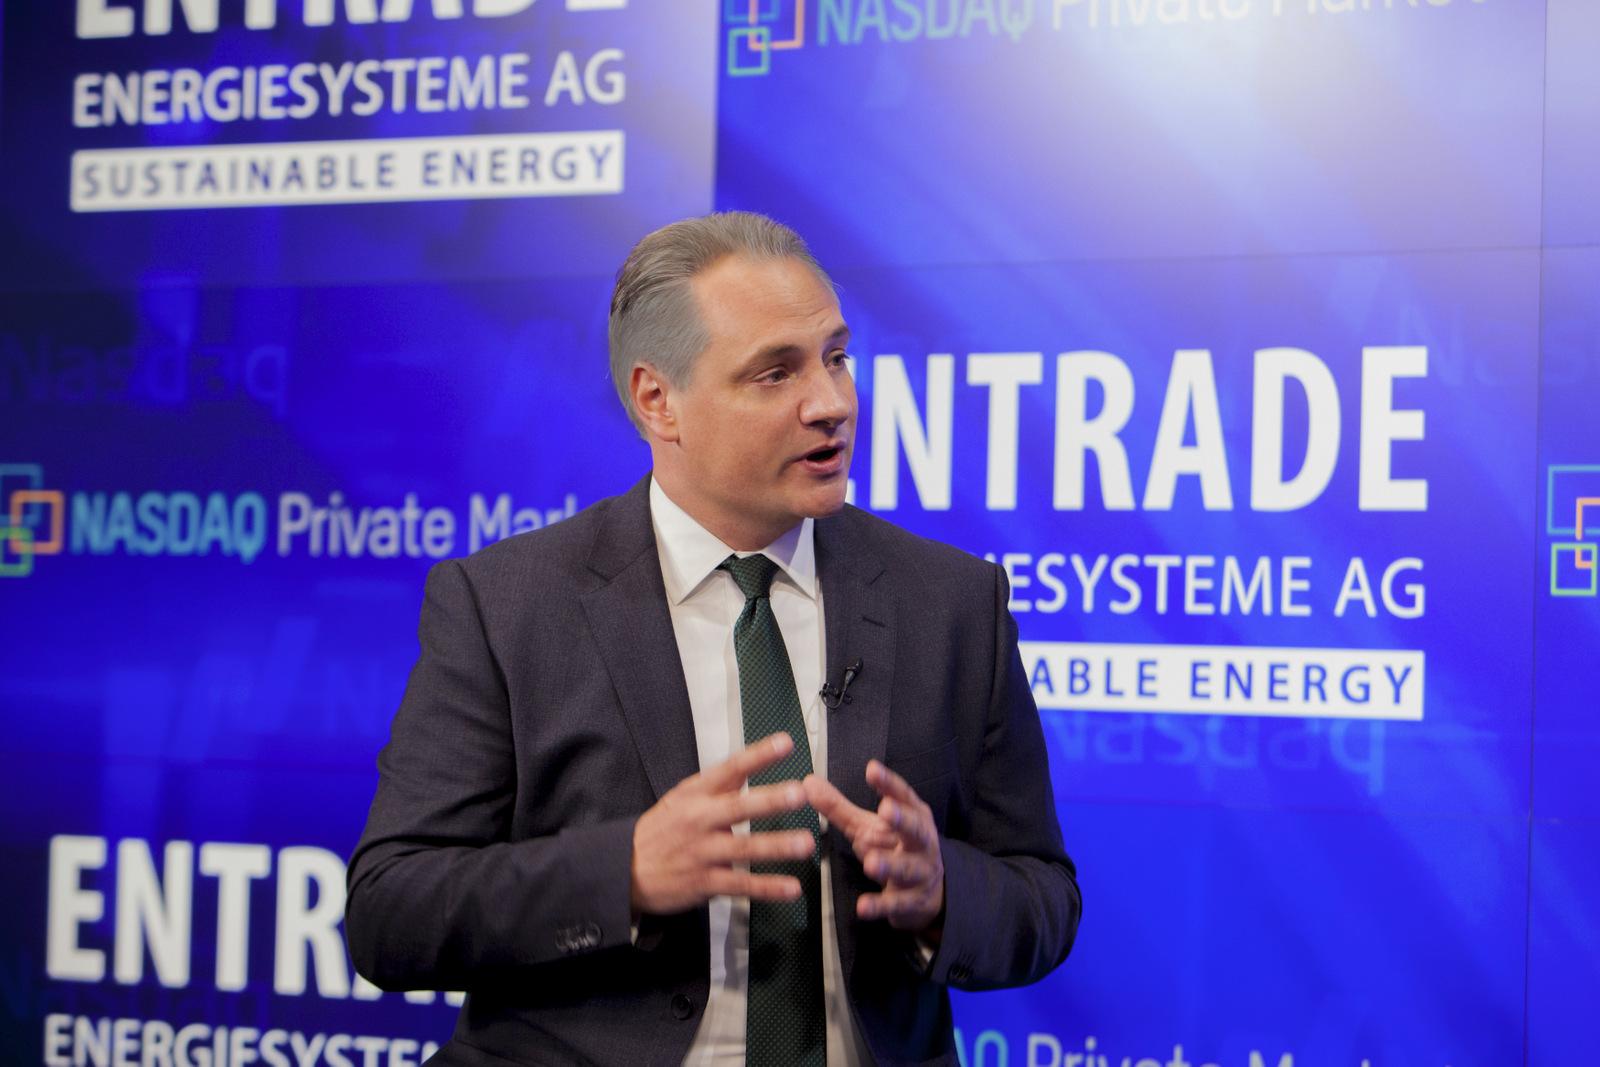 Entradeenergiesysteme102015010